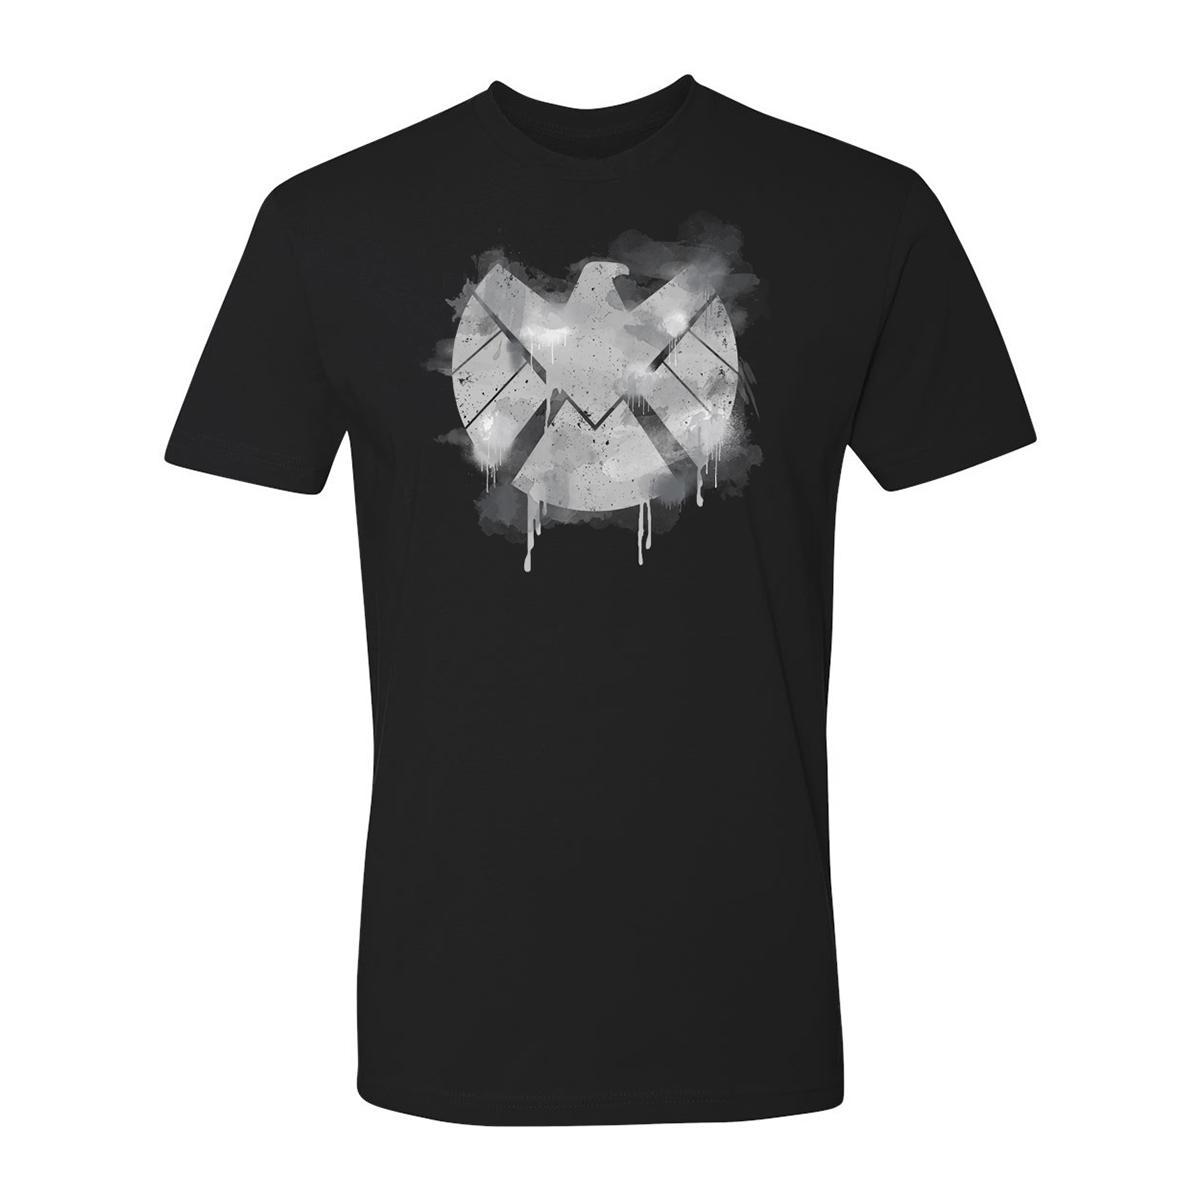 Marvel's Agents of S.H.I.E.L.D Eagle Print T-Shirt